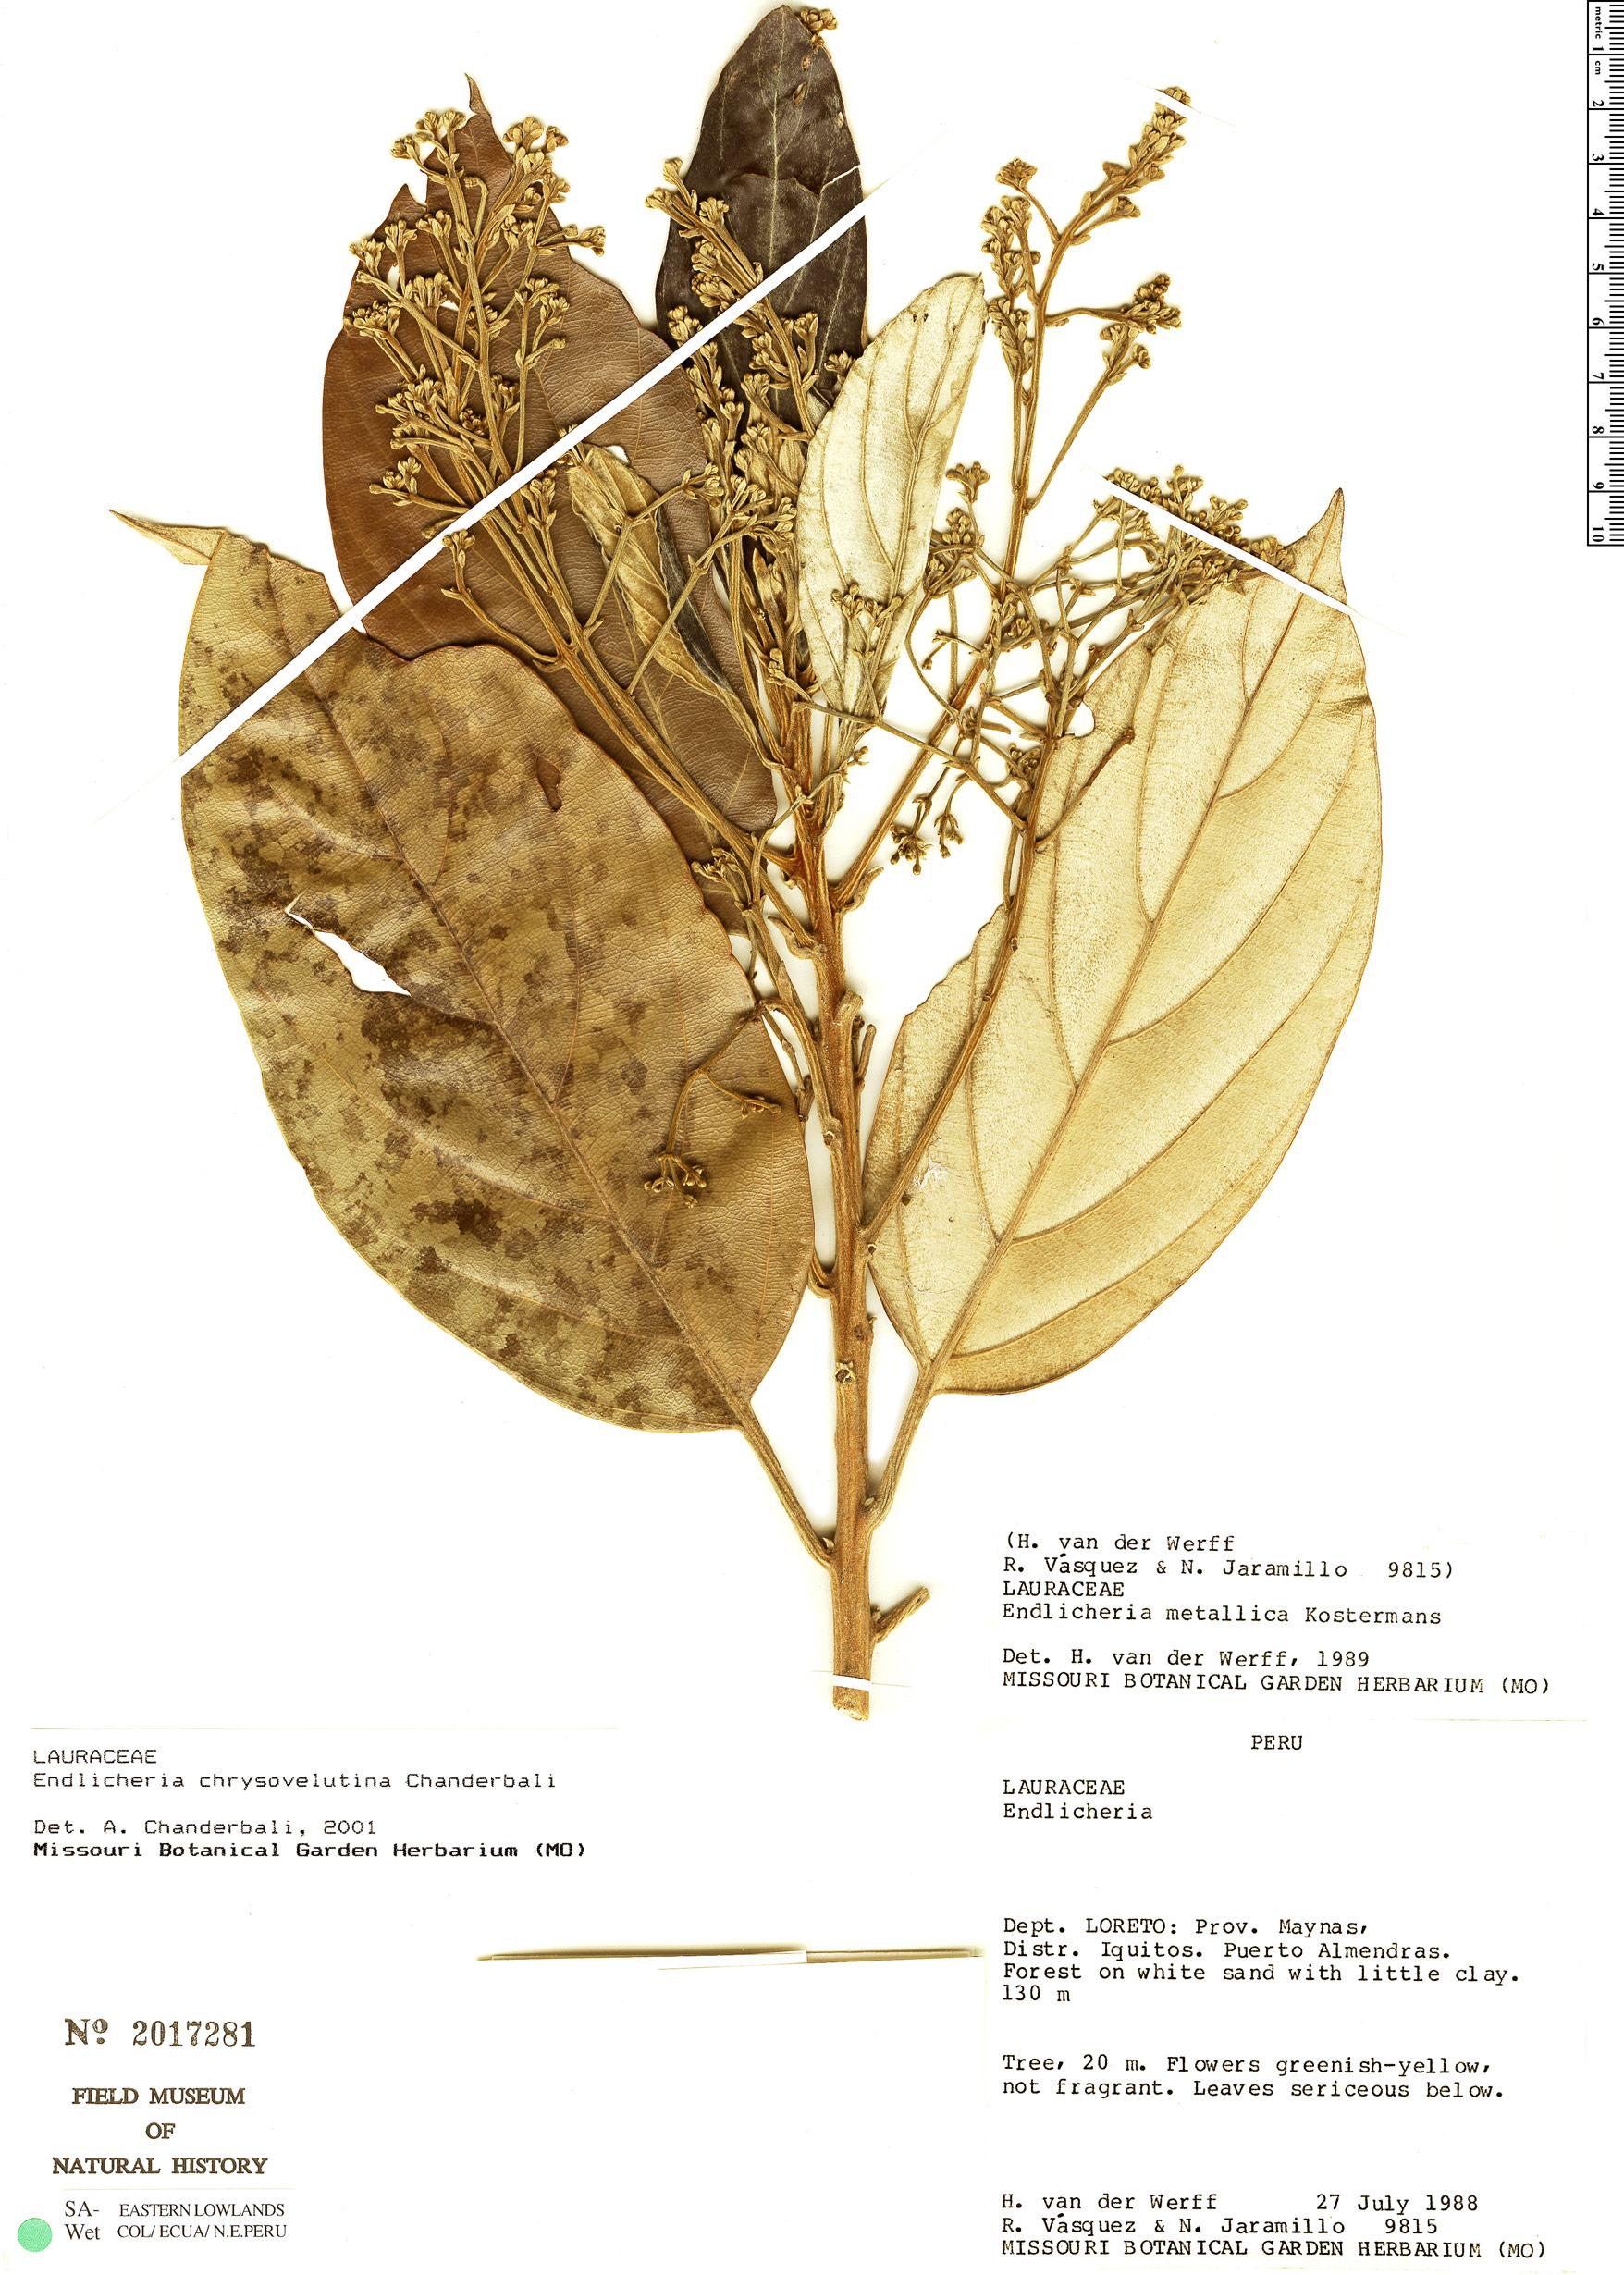 Specimen: Endlicheria chrysovelutina